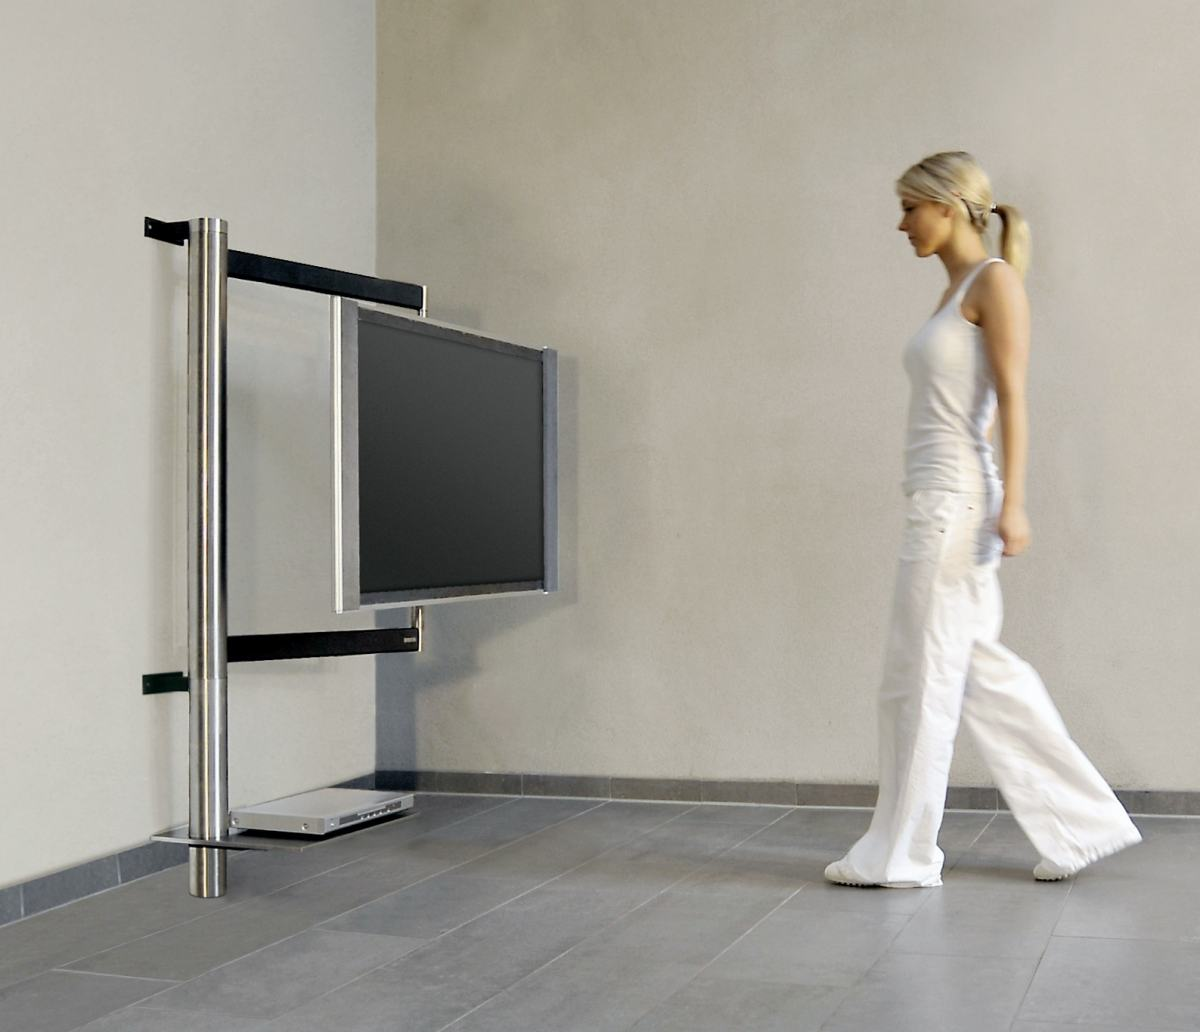 Design tv möbel drehbar  frei drehbare Flatscreen-Wandhalterung: Querstreben, Wandhalterungen ...